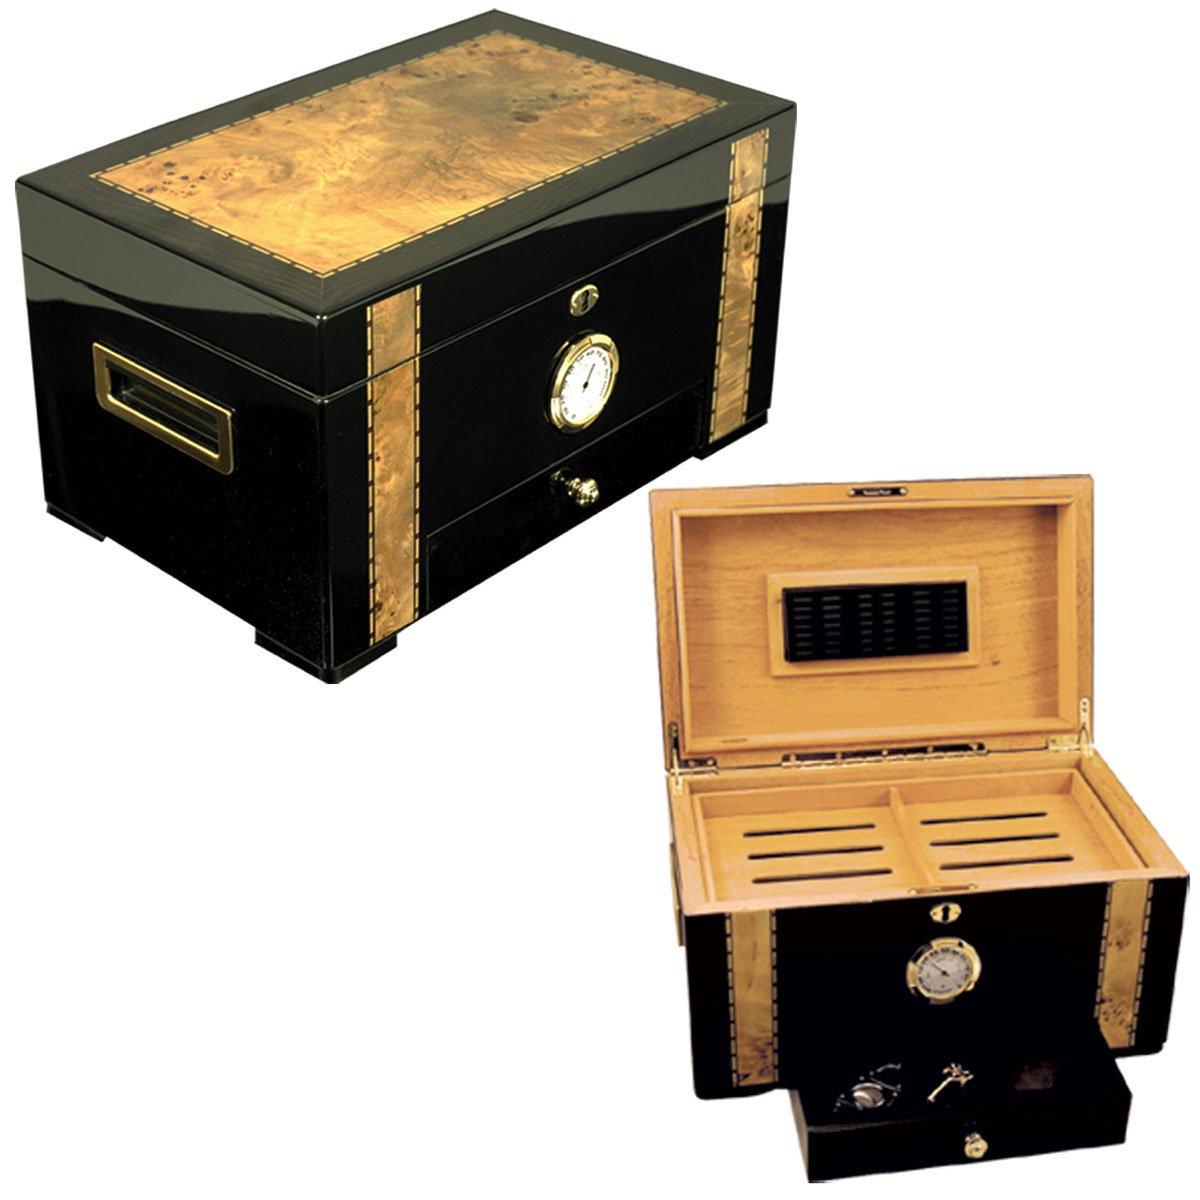 Quality Humidors Exotic Cigar Humidor Cuban Exotica for 150 Cigars